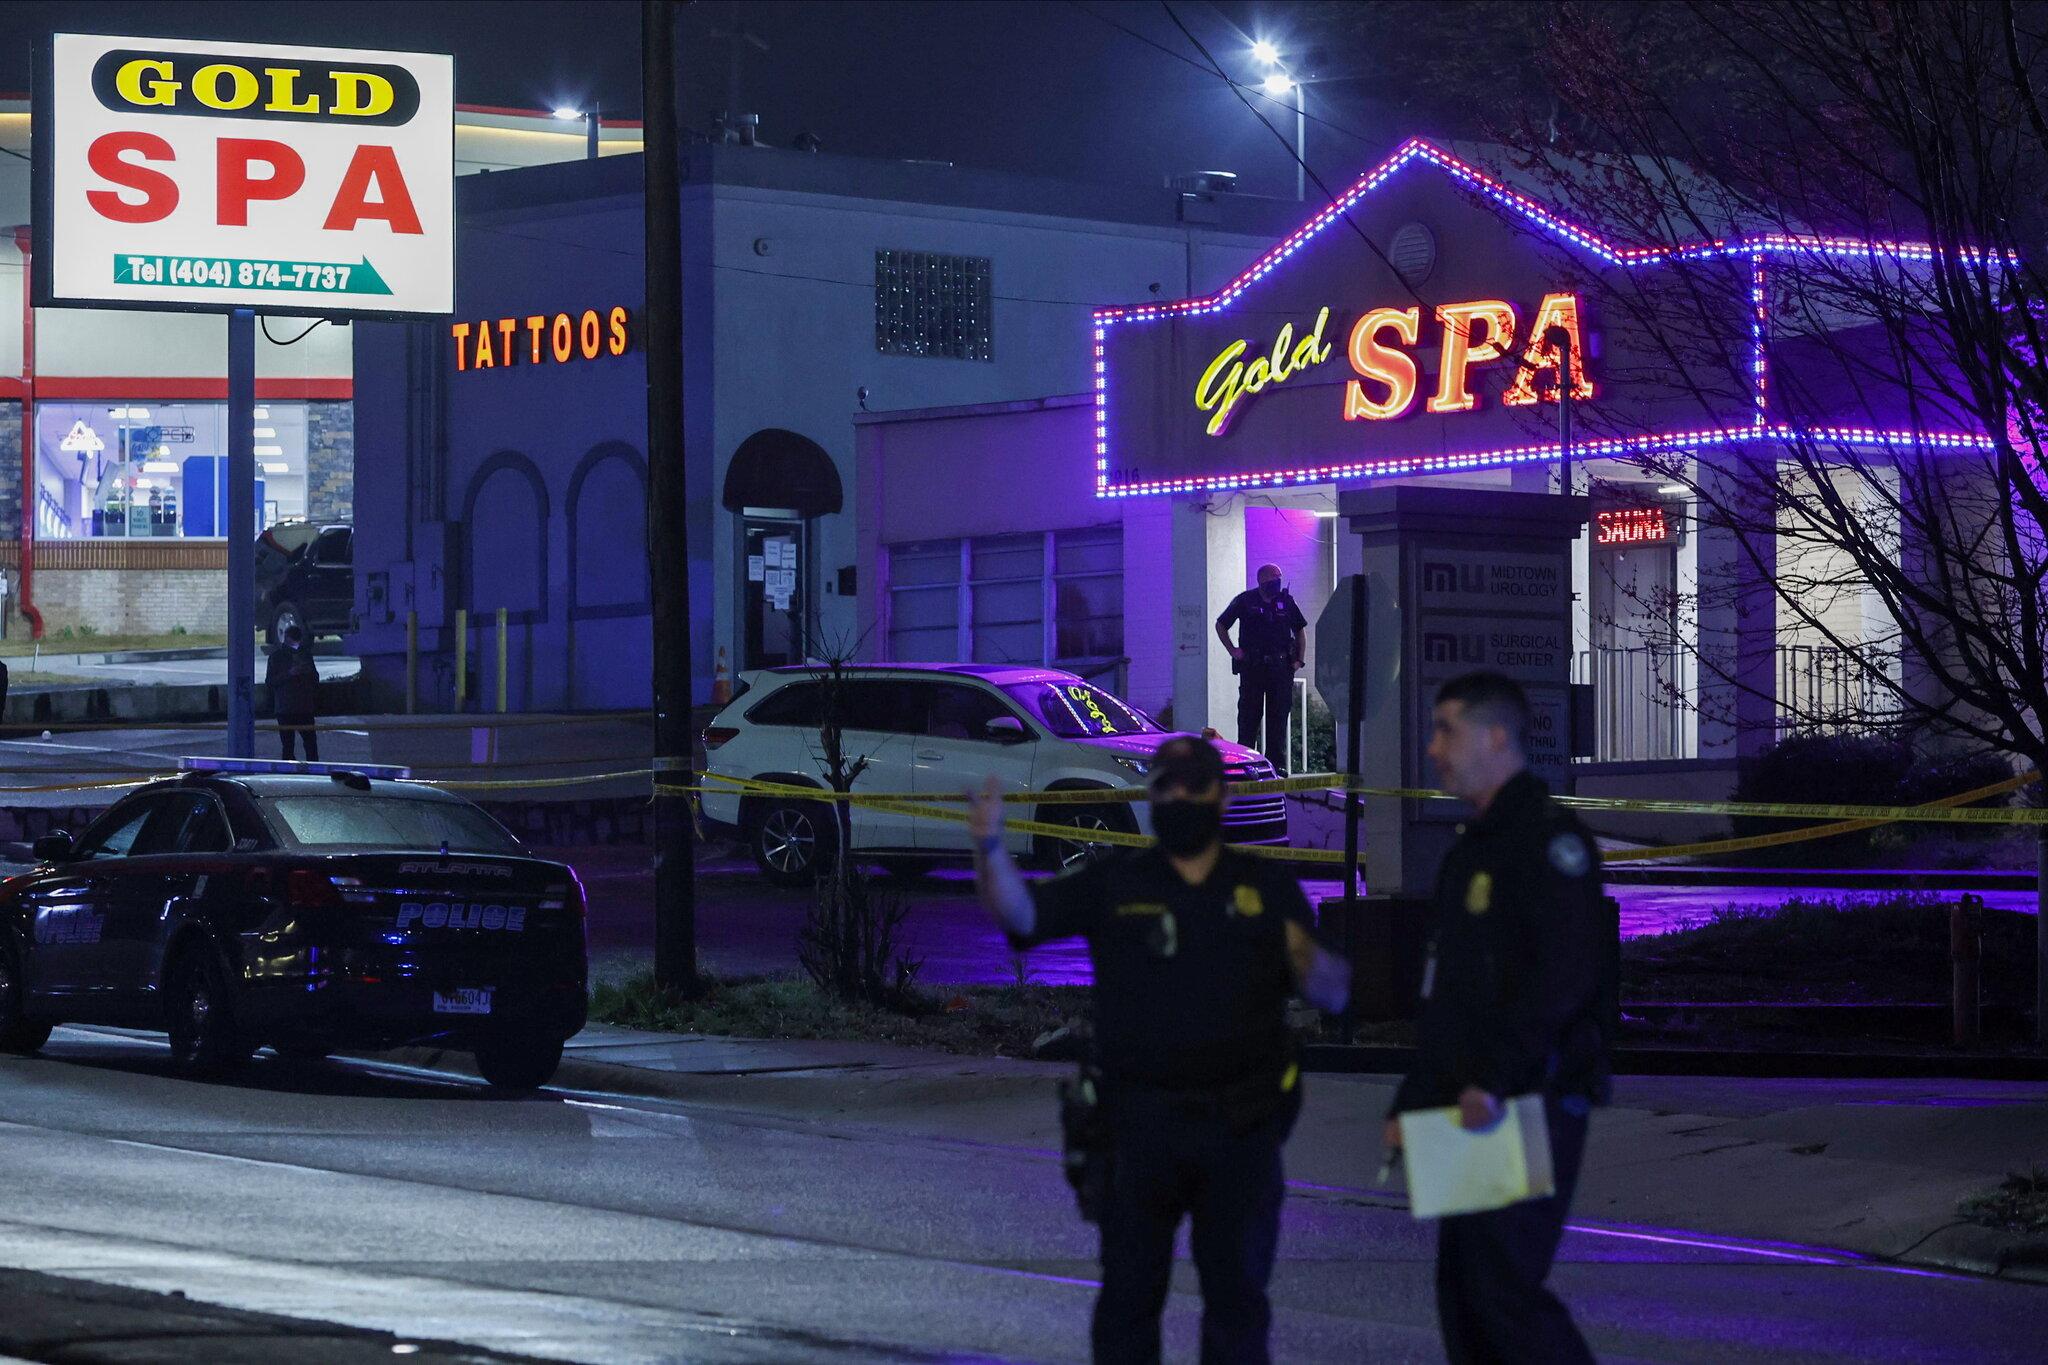 8 People Killed in Atlanta-Area Massage Parlor Shootings